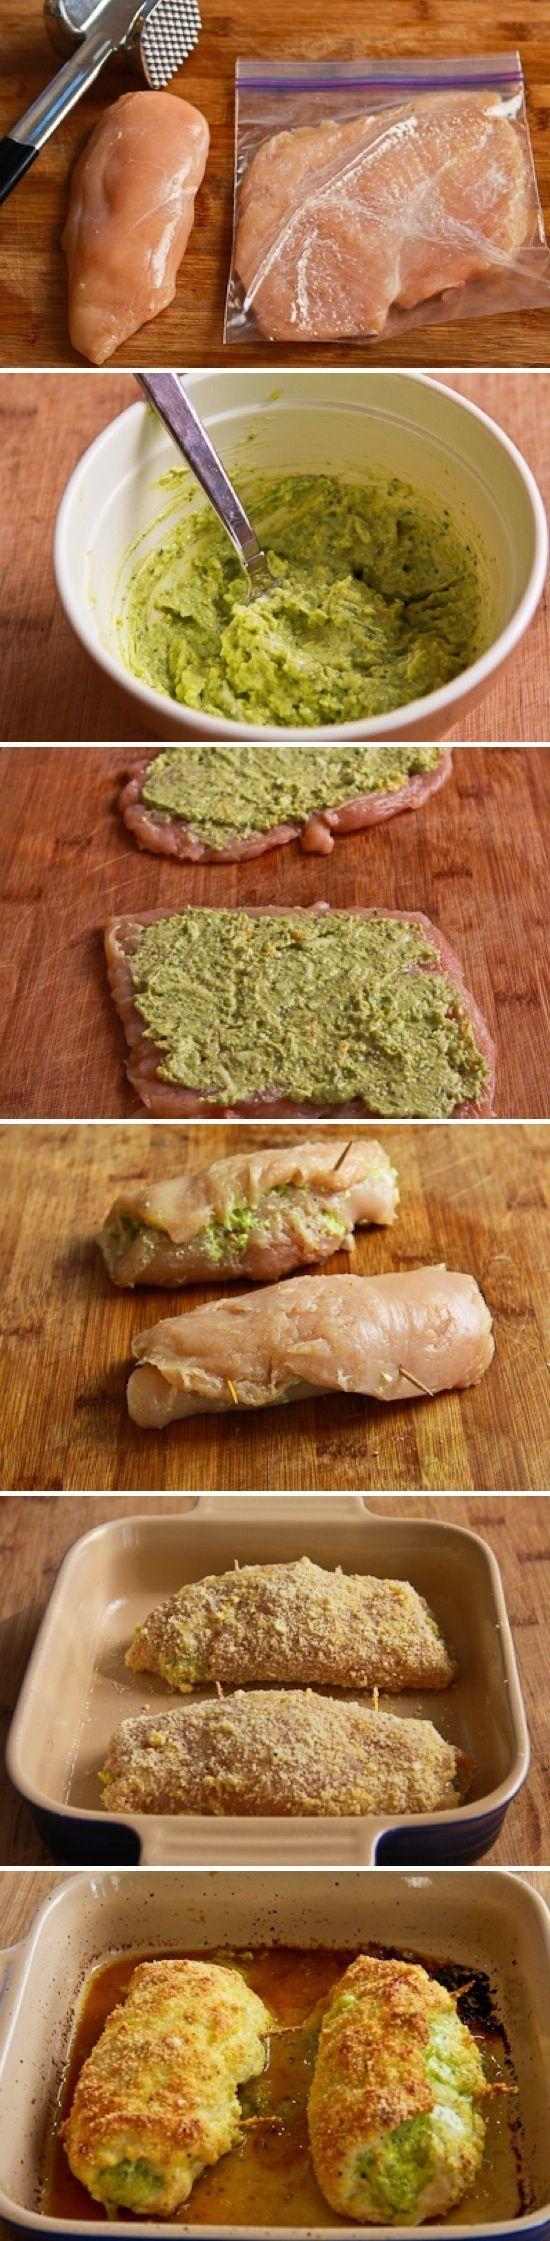 Pesto & Cheese Stuffed Chicken | Recipe By Photo